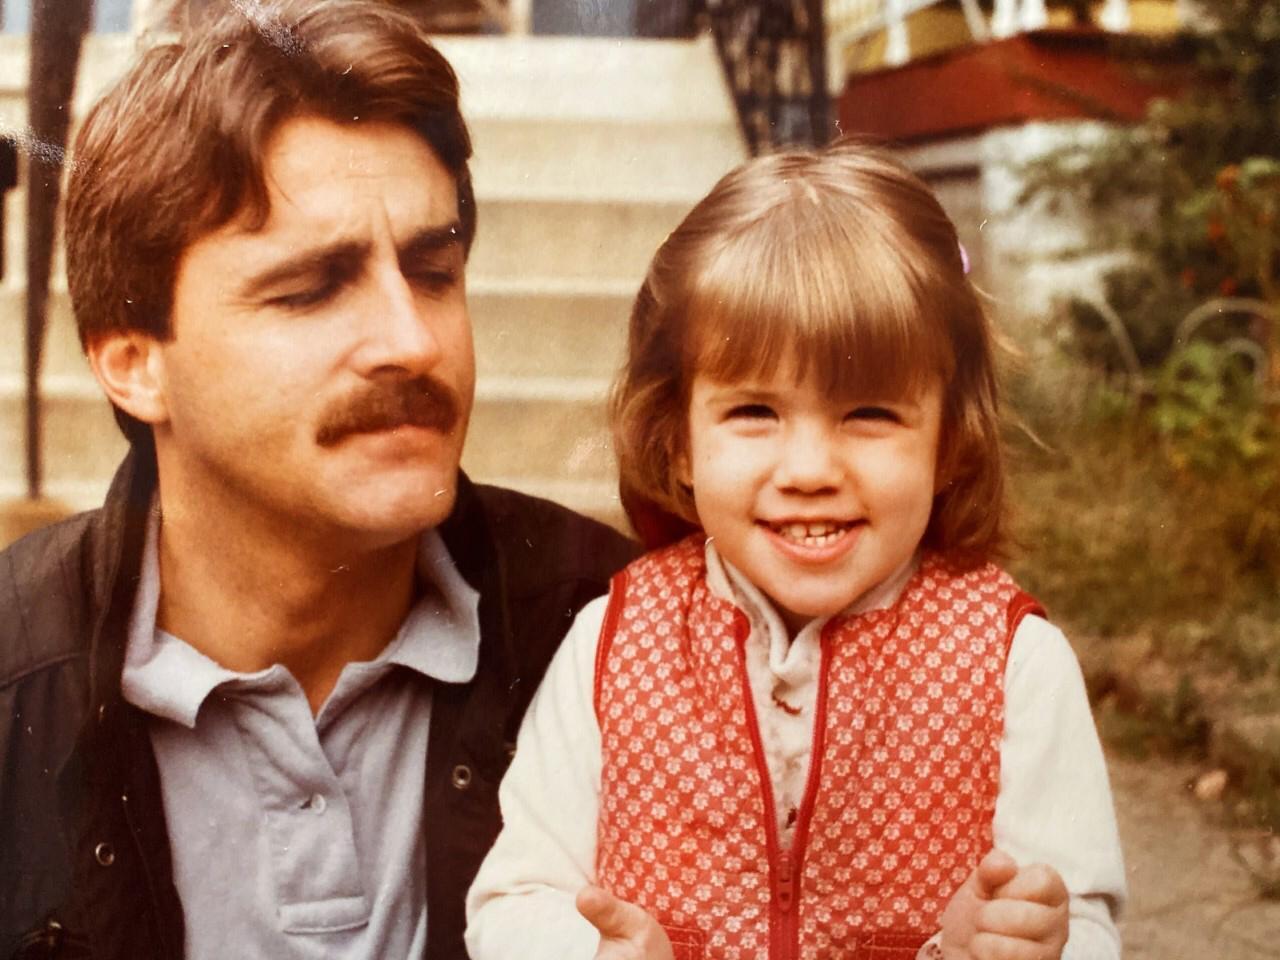 Man looking at daughter